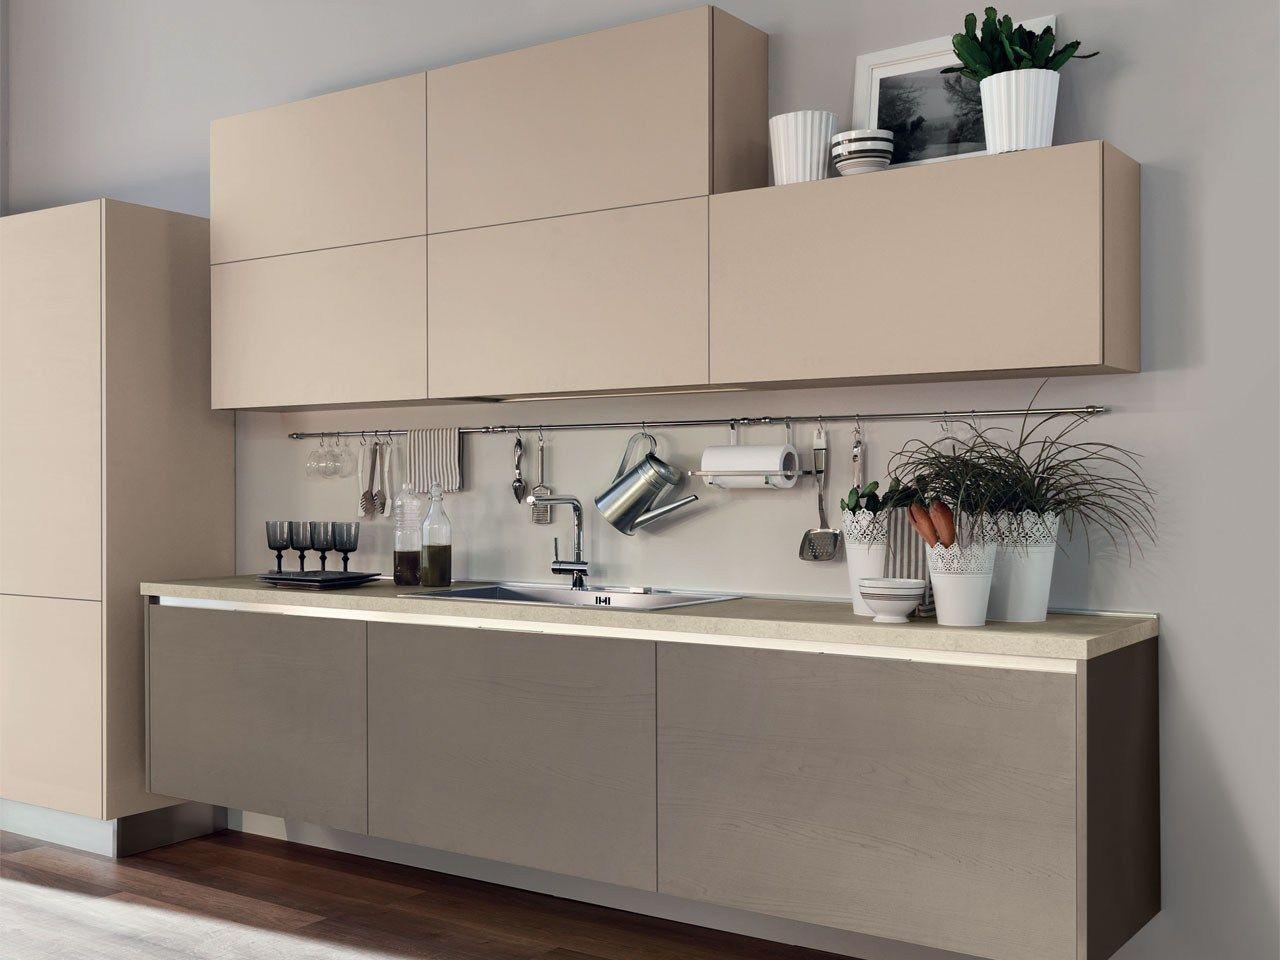 Lube Cucine - Cucina Noemi   Casa   Pinterest   Cucina and Kitchens